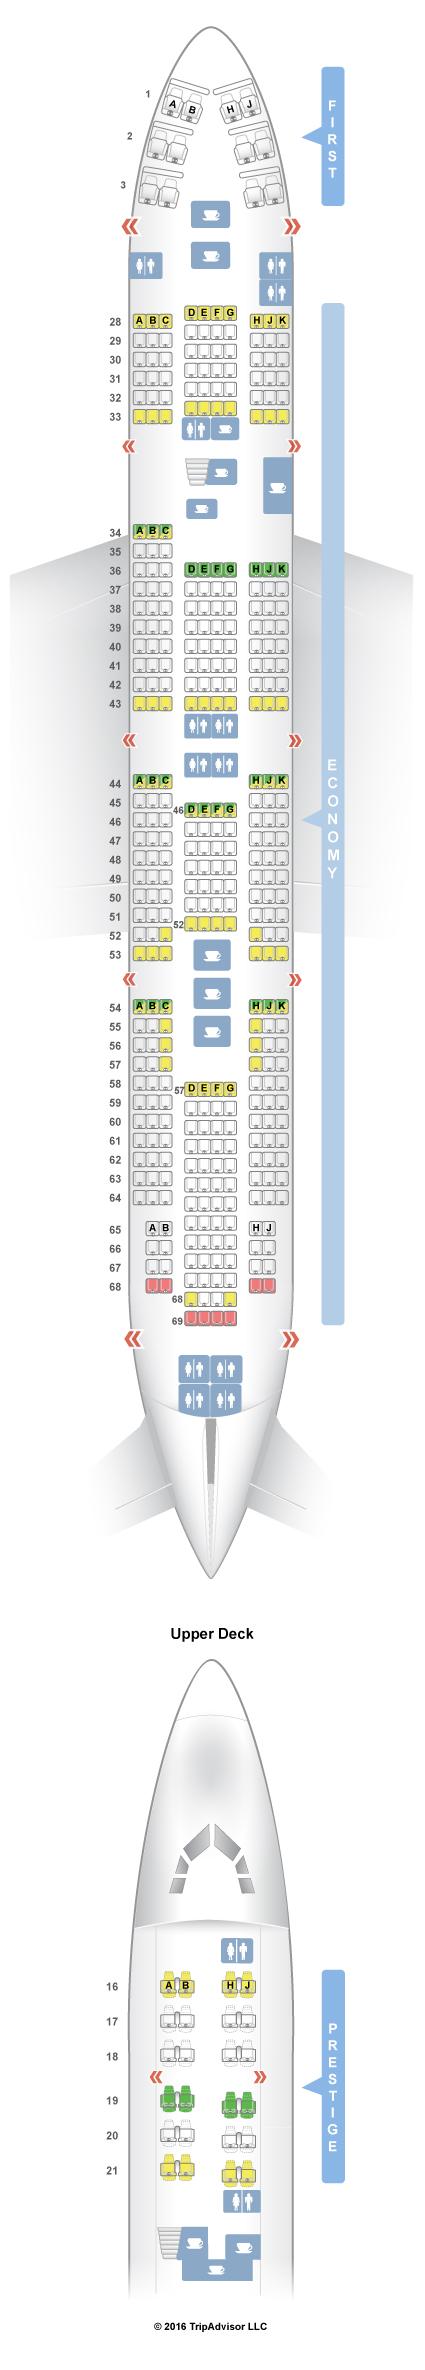 SeatGuru Seat Map Korean Air on